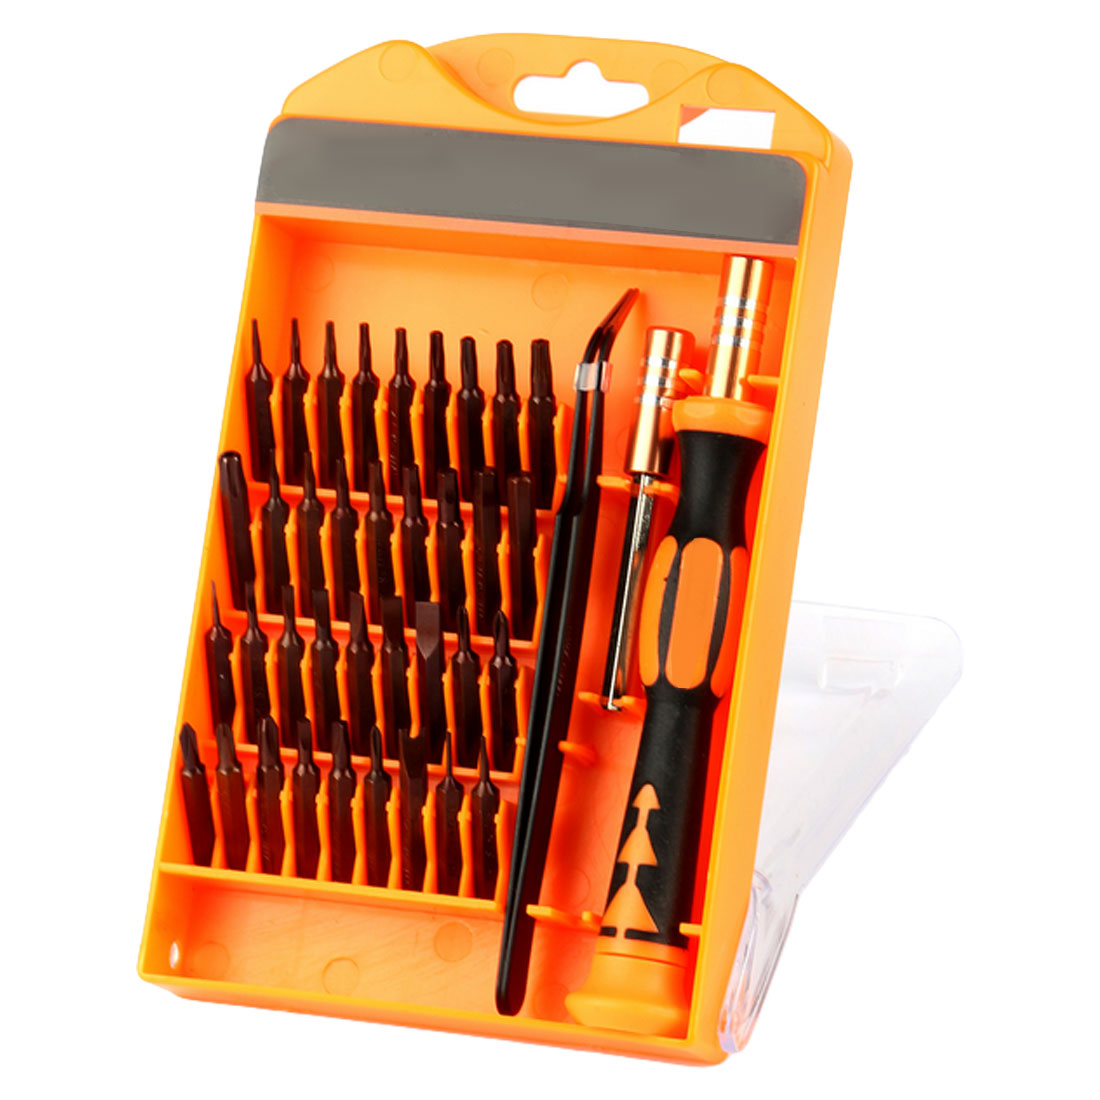 39 in 1 Mini Electronic Screwdriver Bits Multifunctional Precision Screwdriver Set For iPhone/Laptop Repair Tools Kit Set